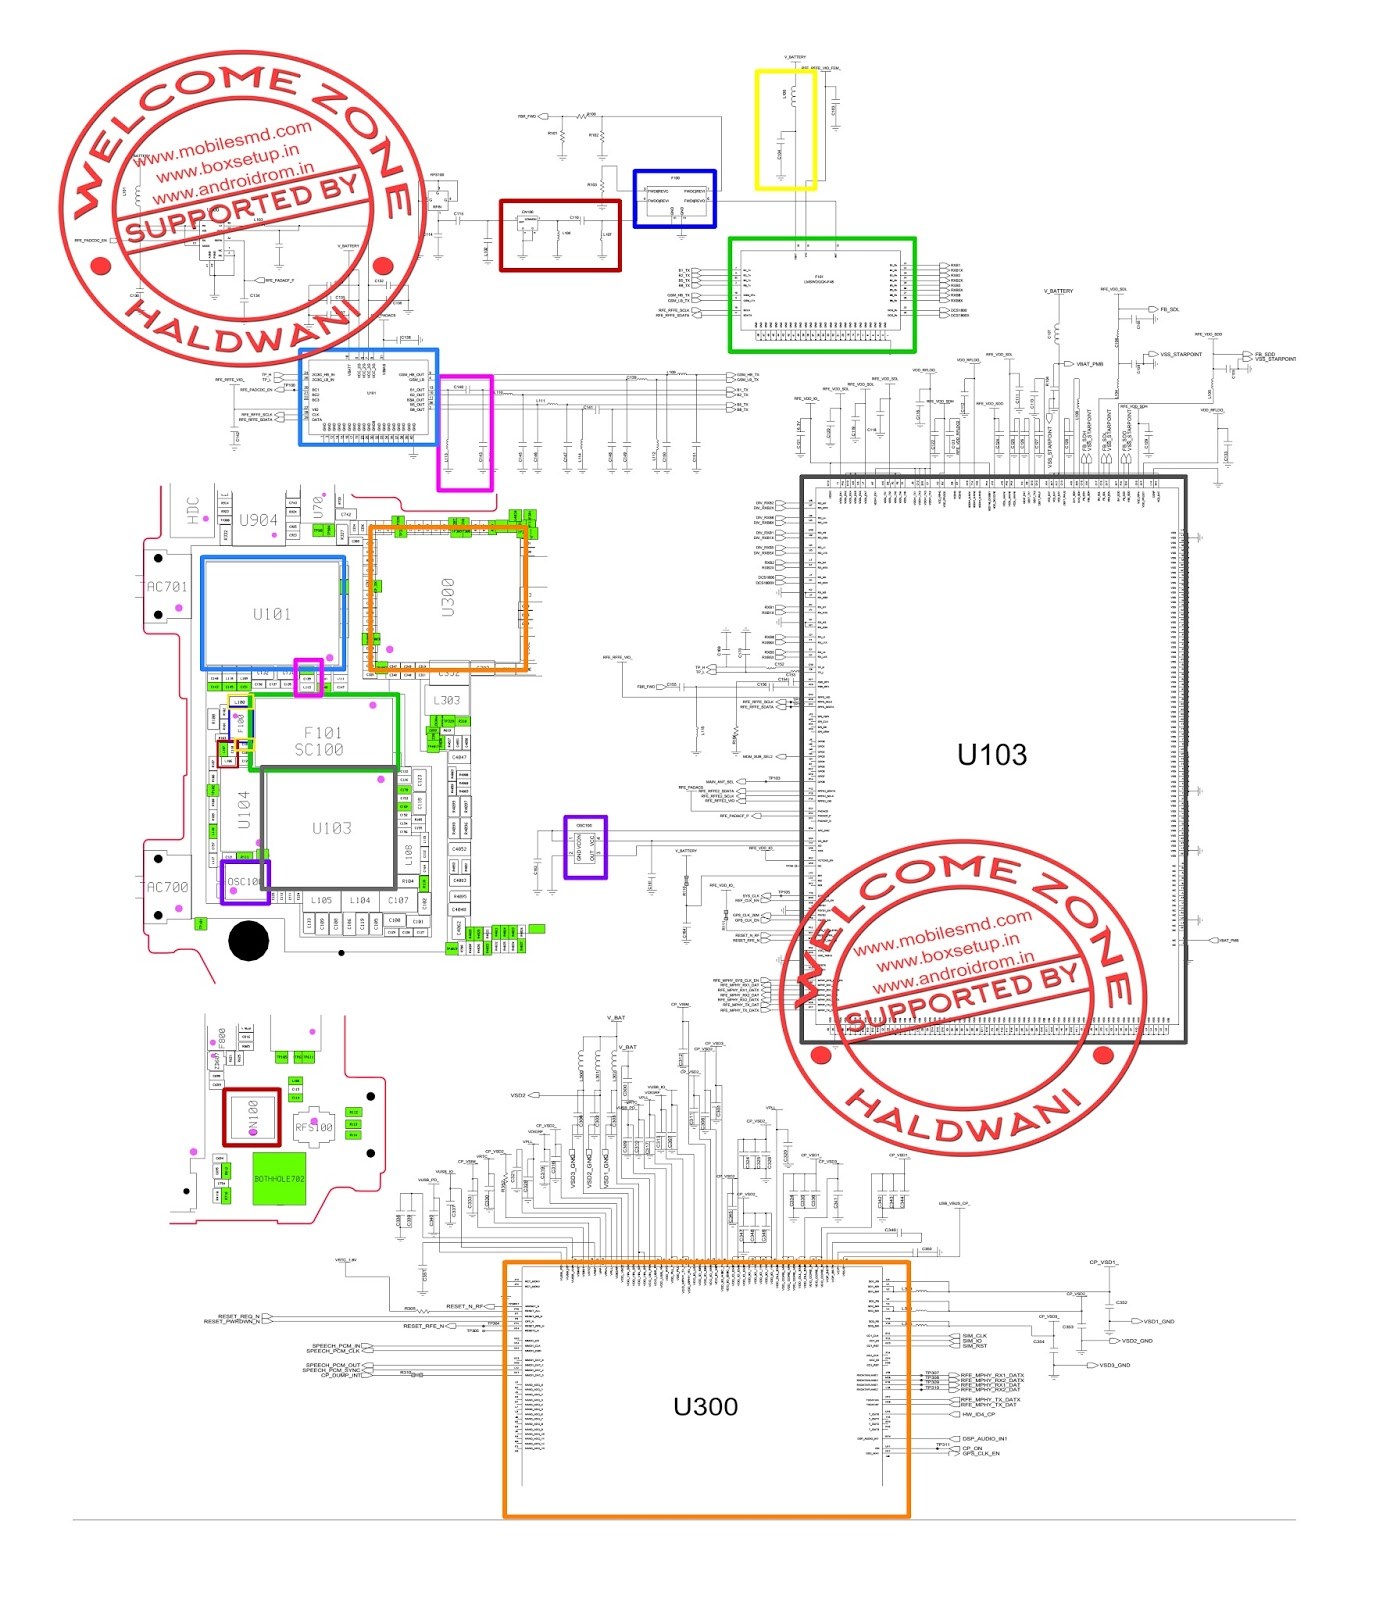 hsh wiring diagram steam turbine process flow emg otax vlx91 for pick up